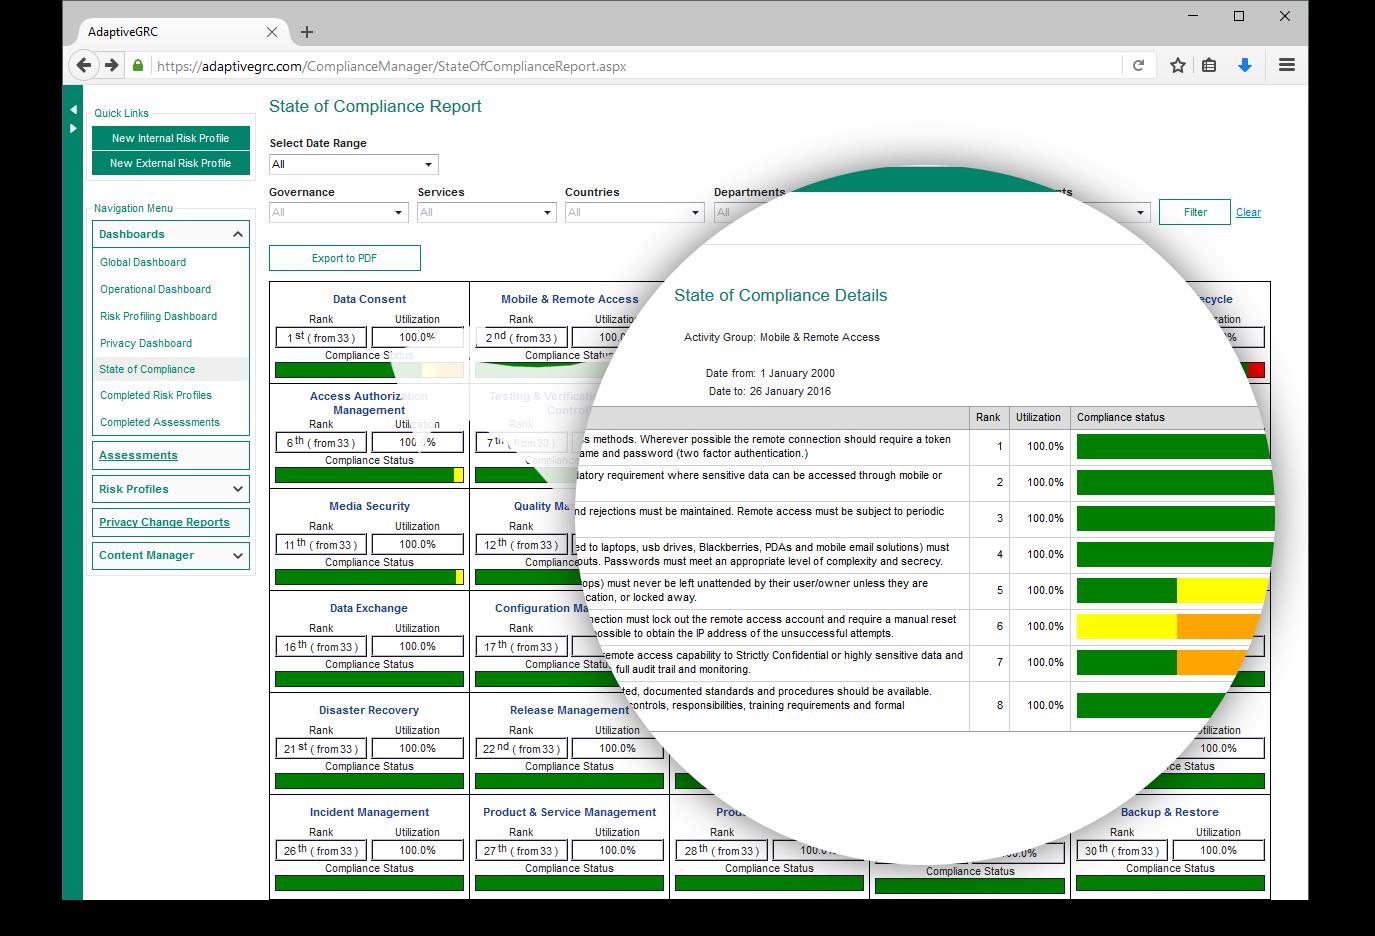 AdaptiveGRC Demo - AdaptiveGRC Compliance Manager